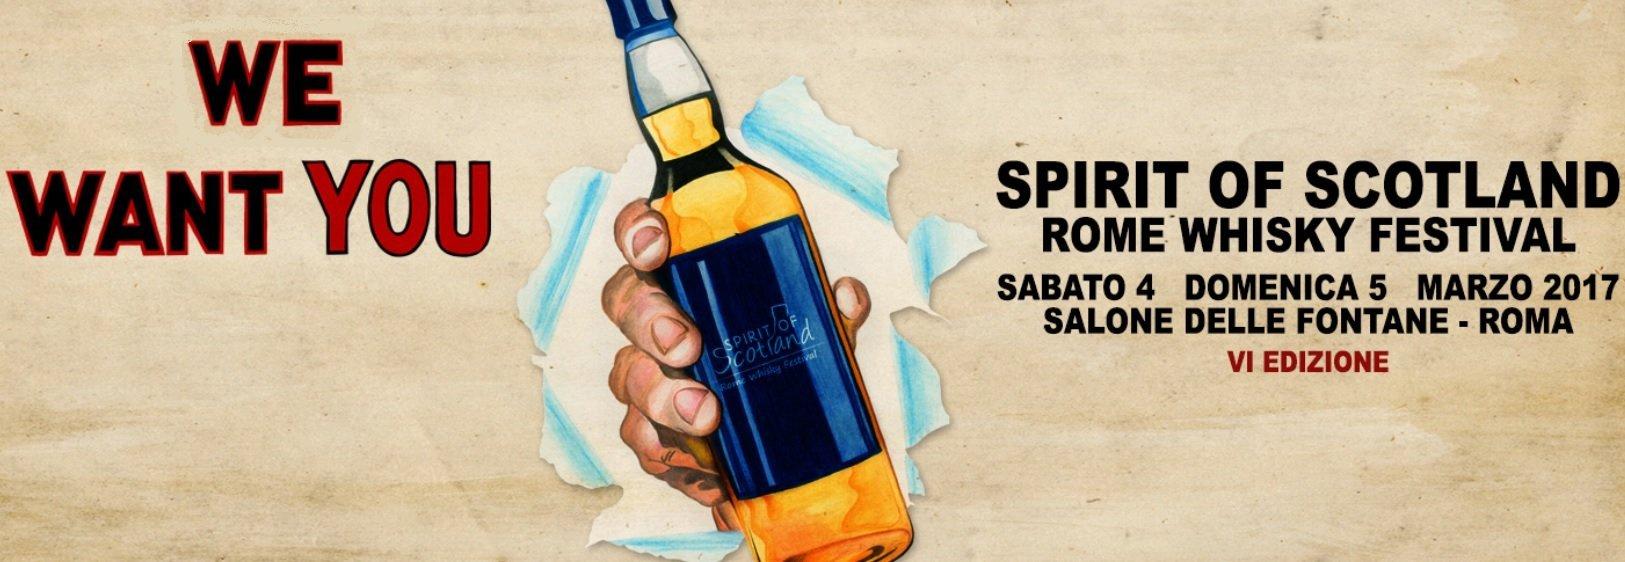 Arriva a Roma lo Spirito scozzese! Whisky e…